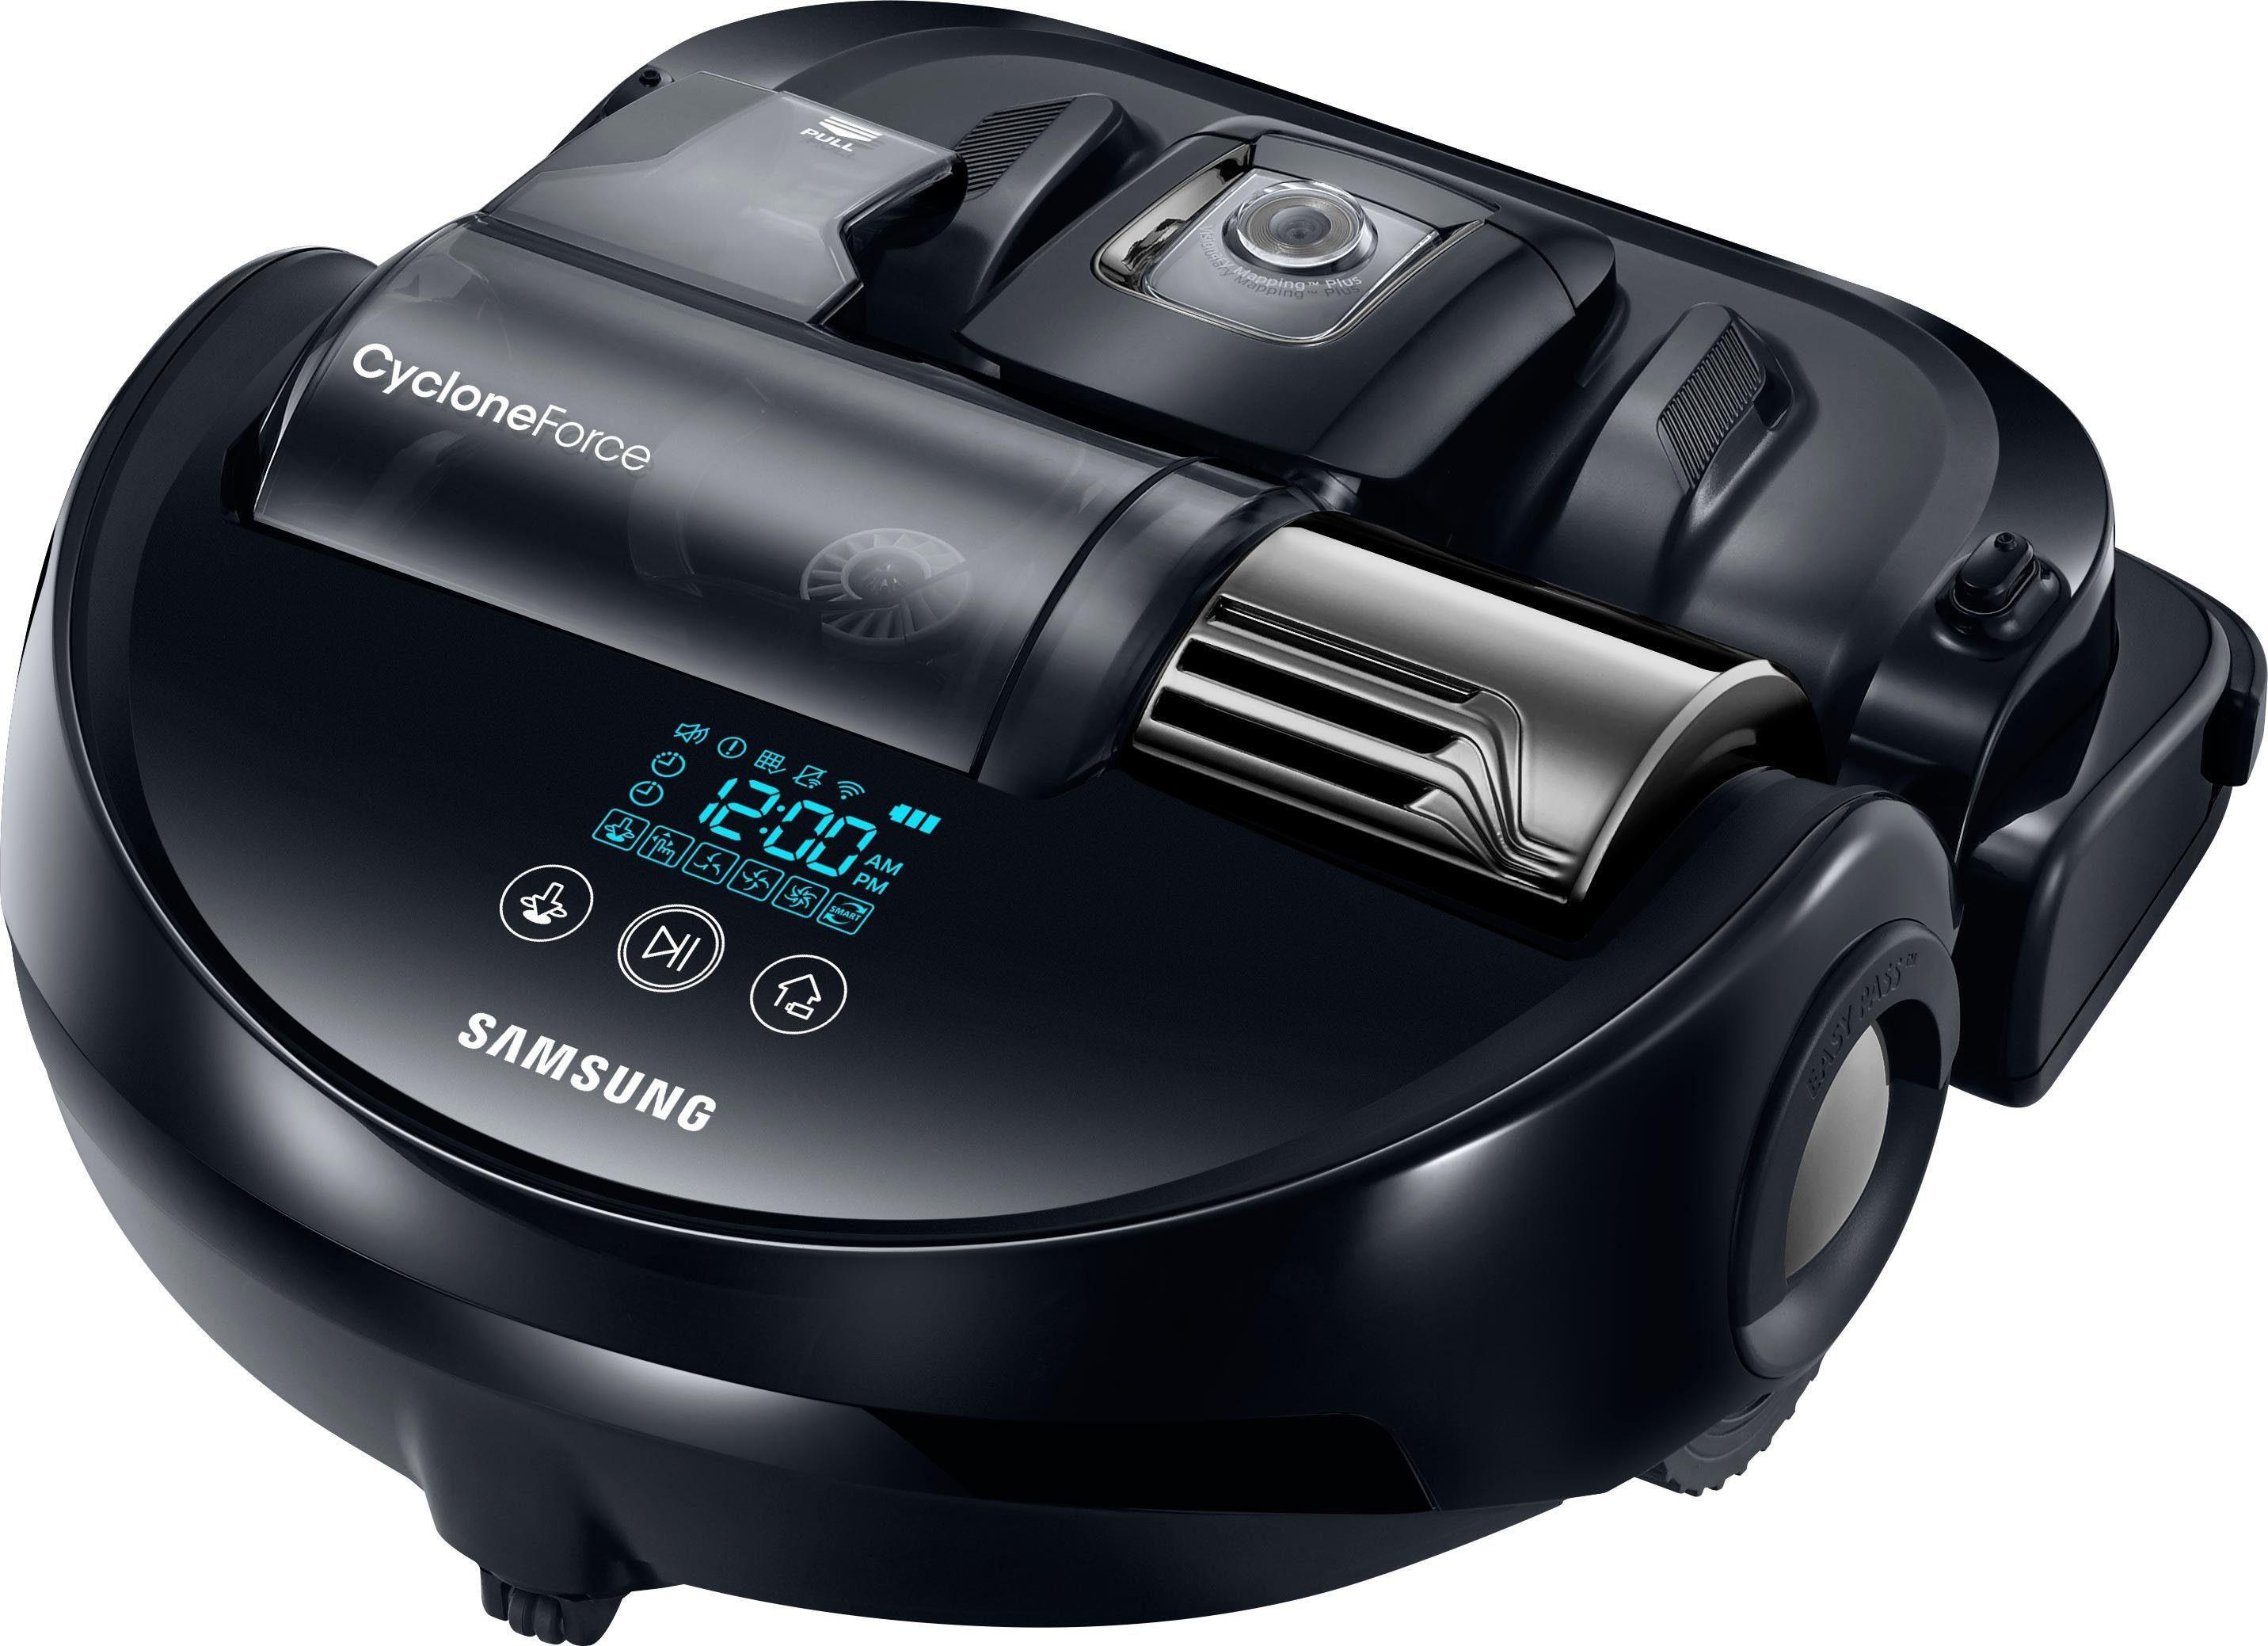 Samsung Saugroboter VR20J9259UC/EG/ POWERbot VR9200, 180 Watt, beutellos, Saugstarker Motor mit Cyclone Force